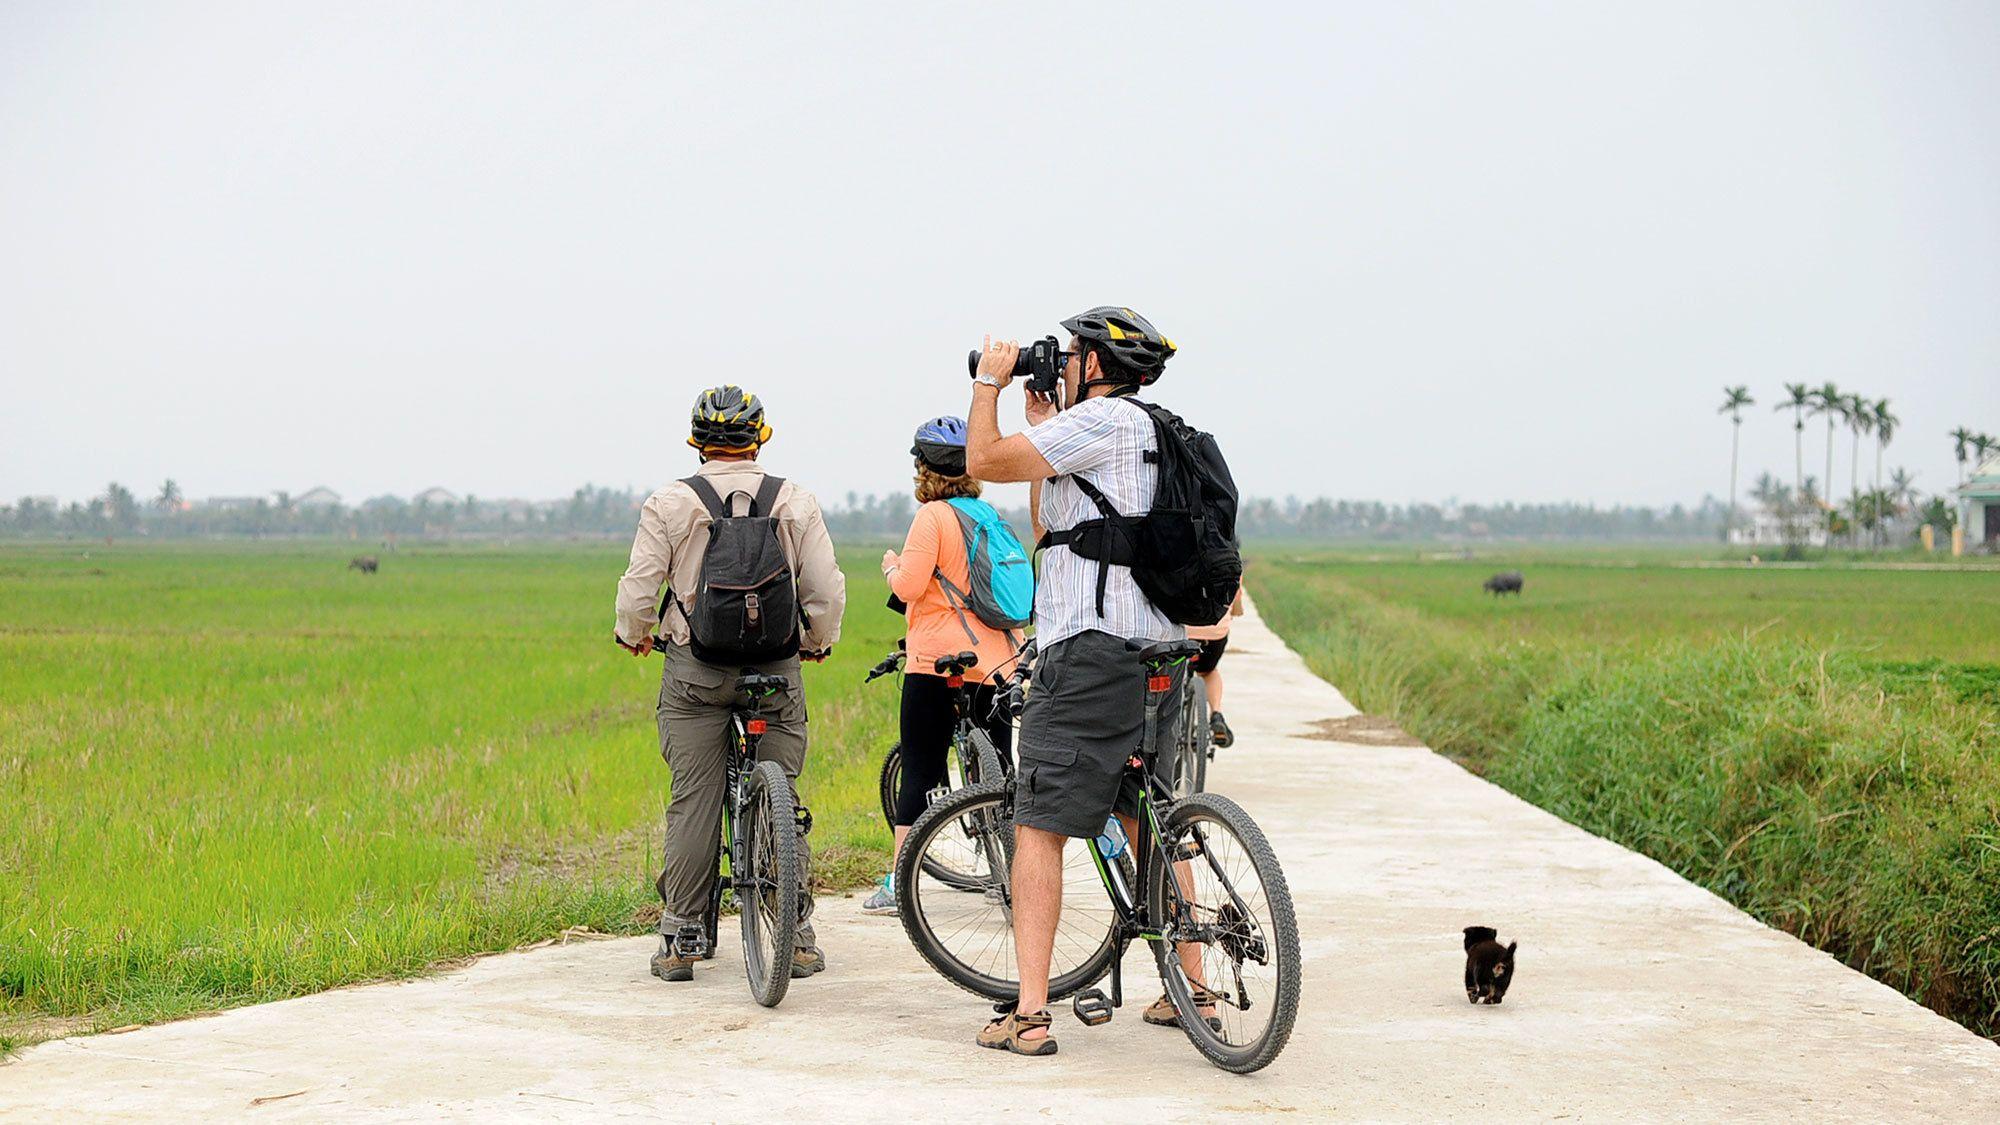 Countryside bike tour in Hoi An